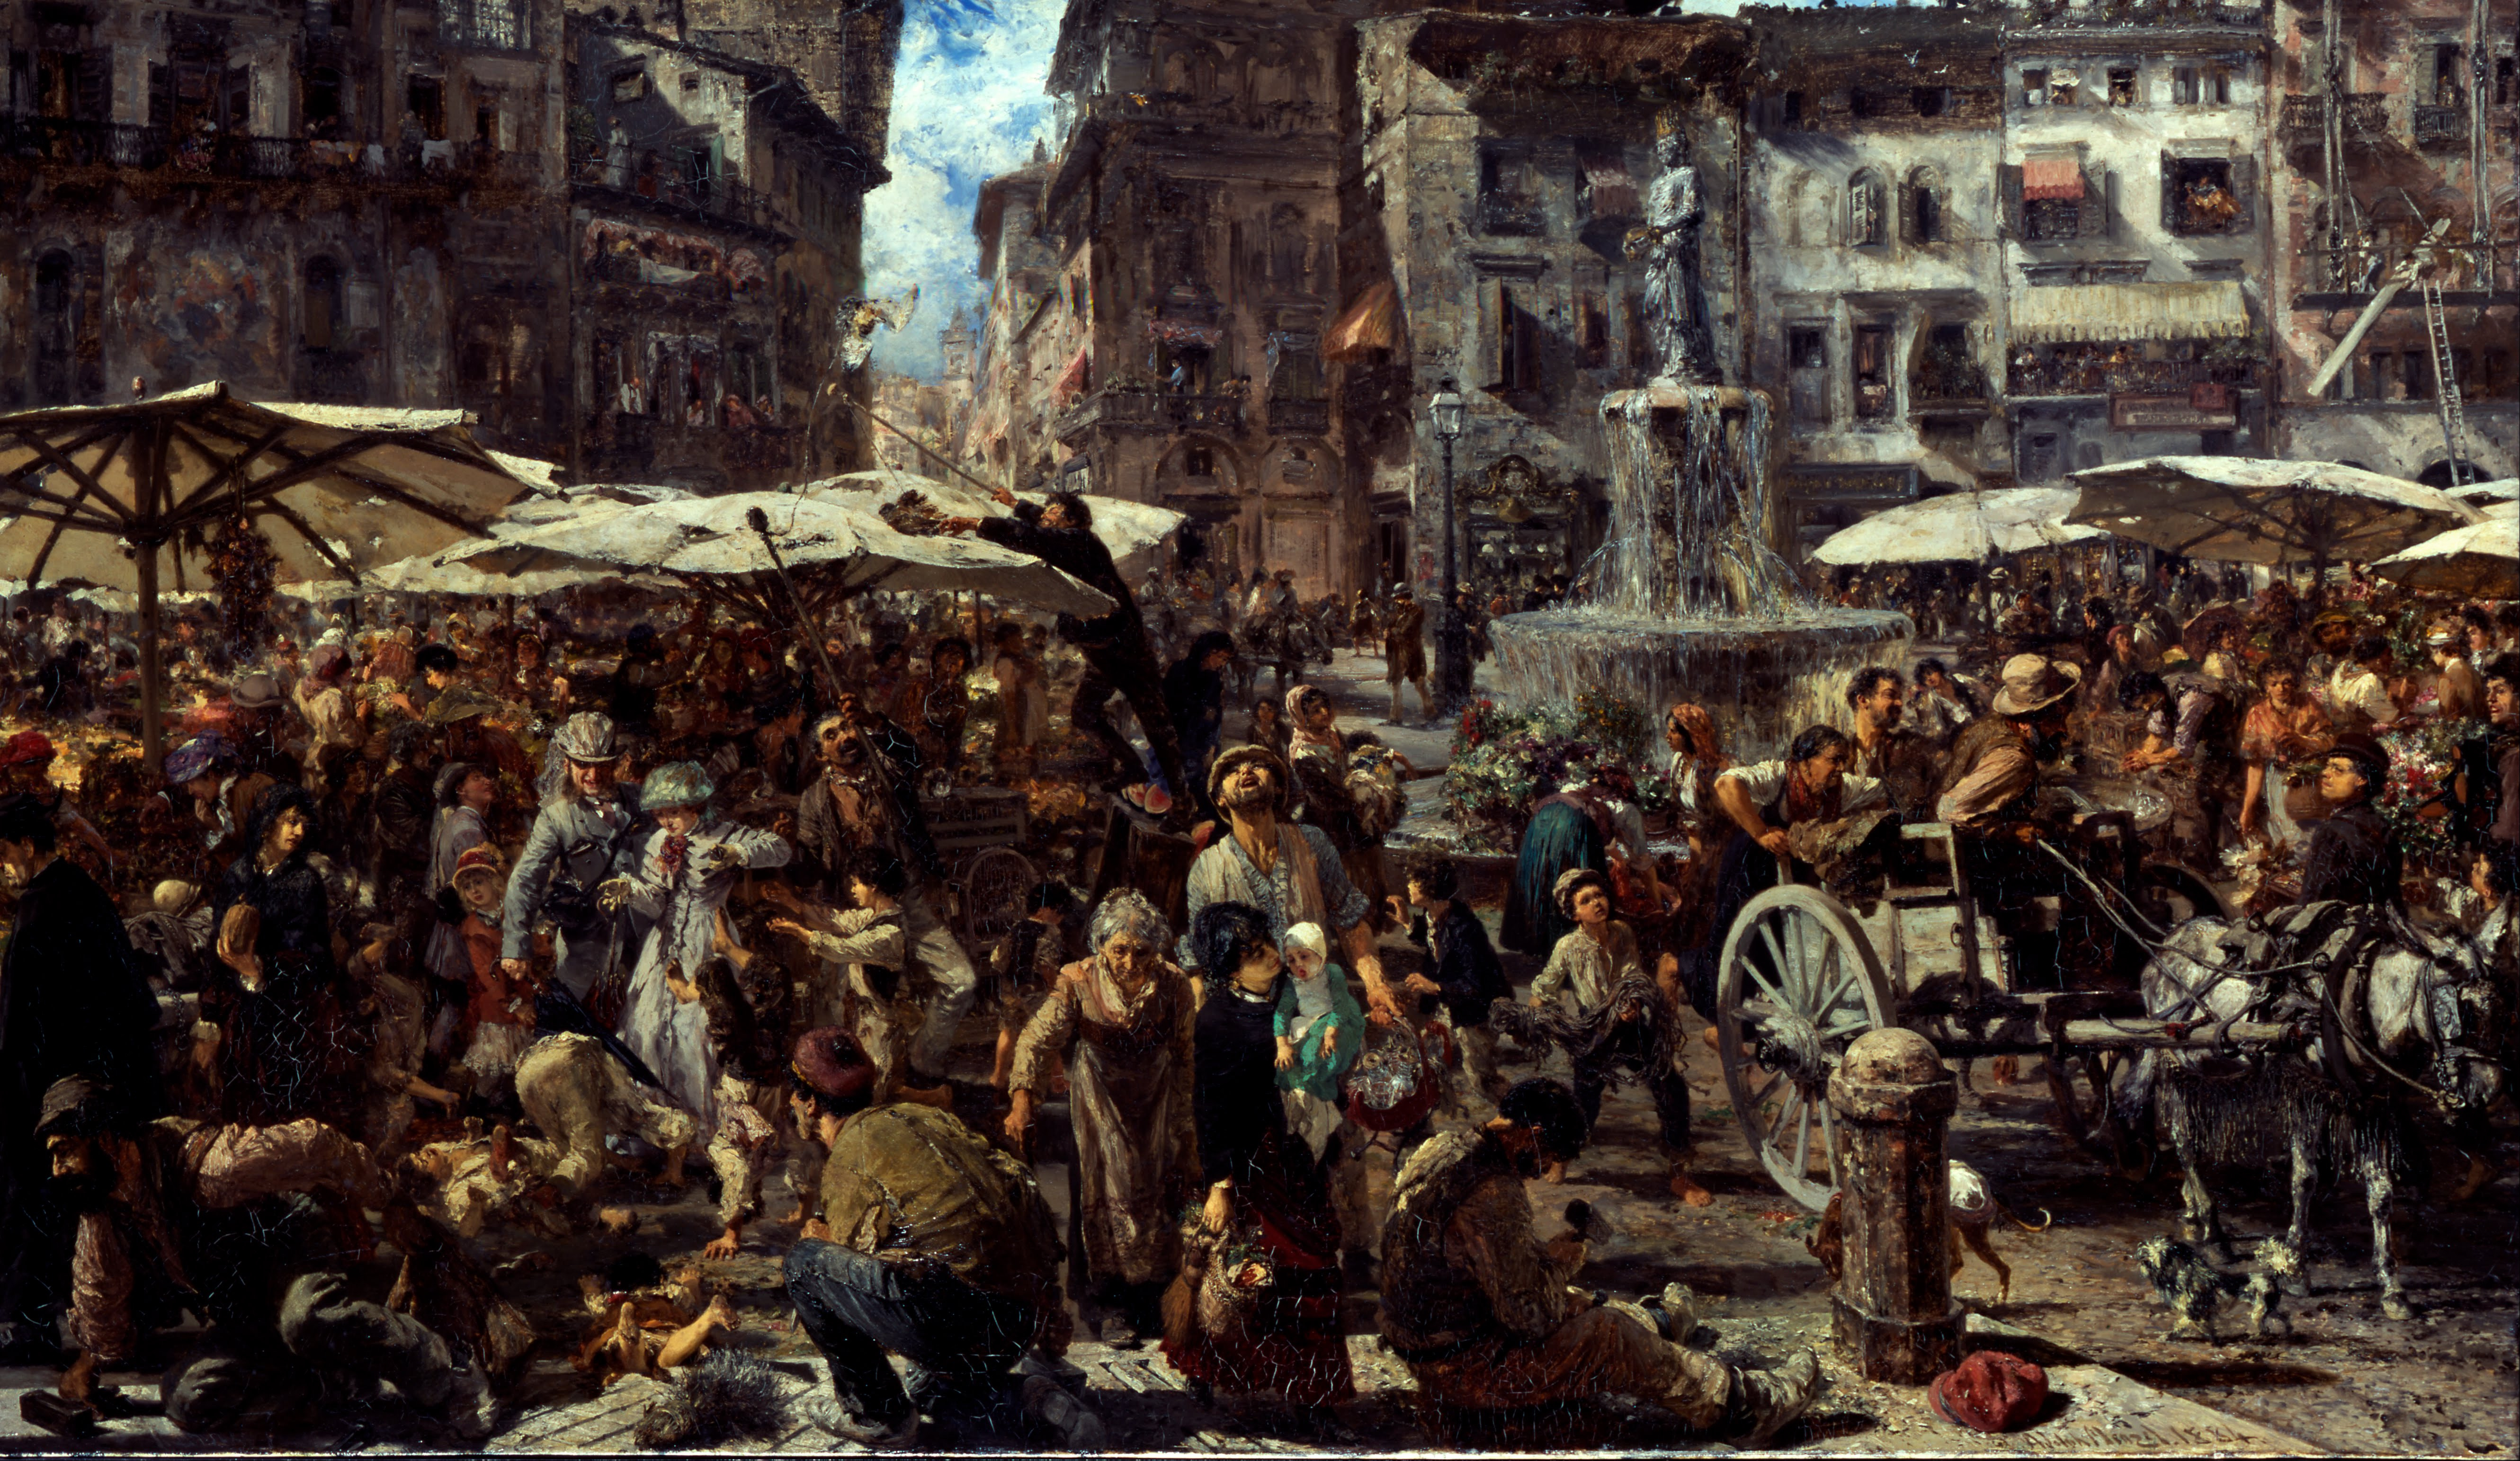 adolph_menzel_-_piazza_derbe_in_verona_-_google_art_project